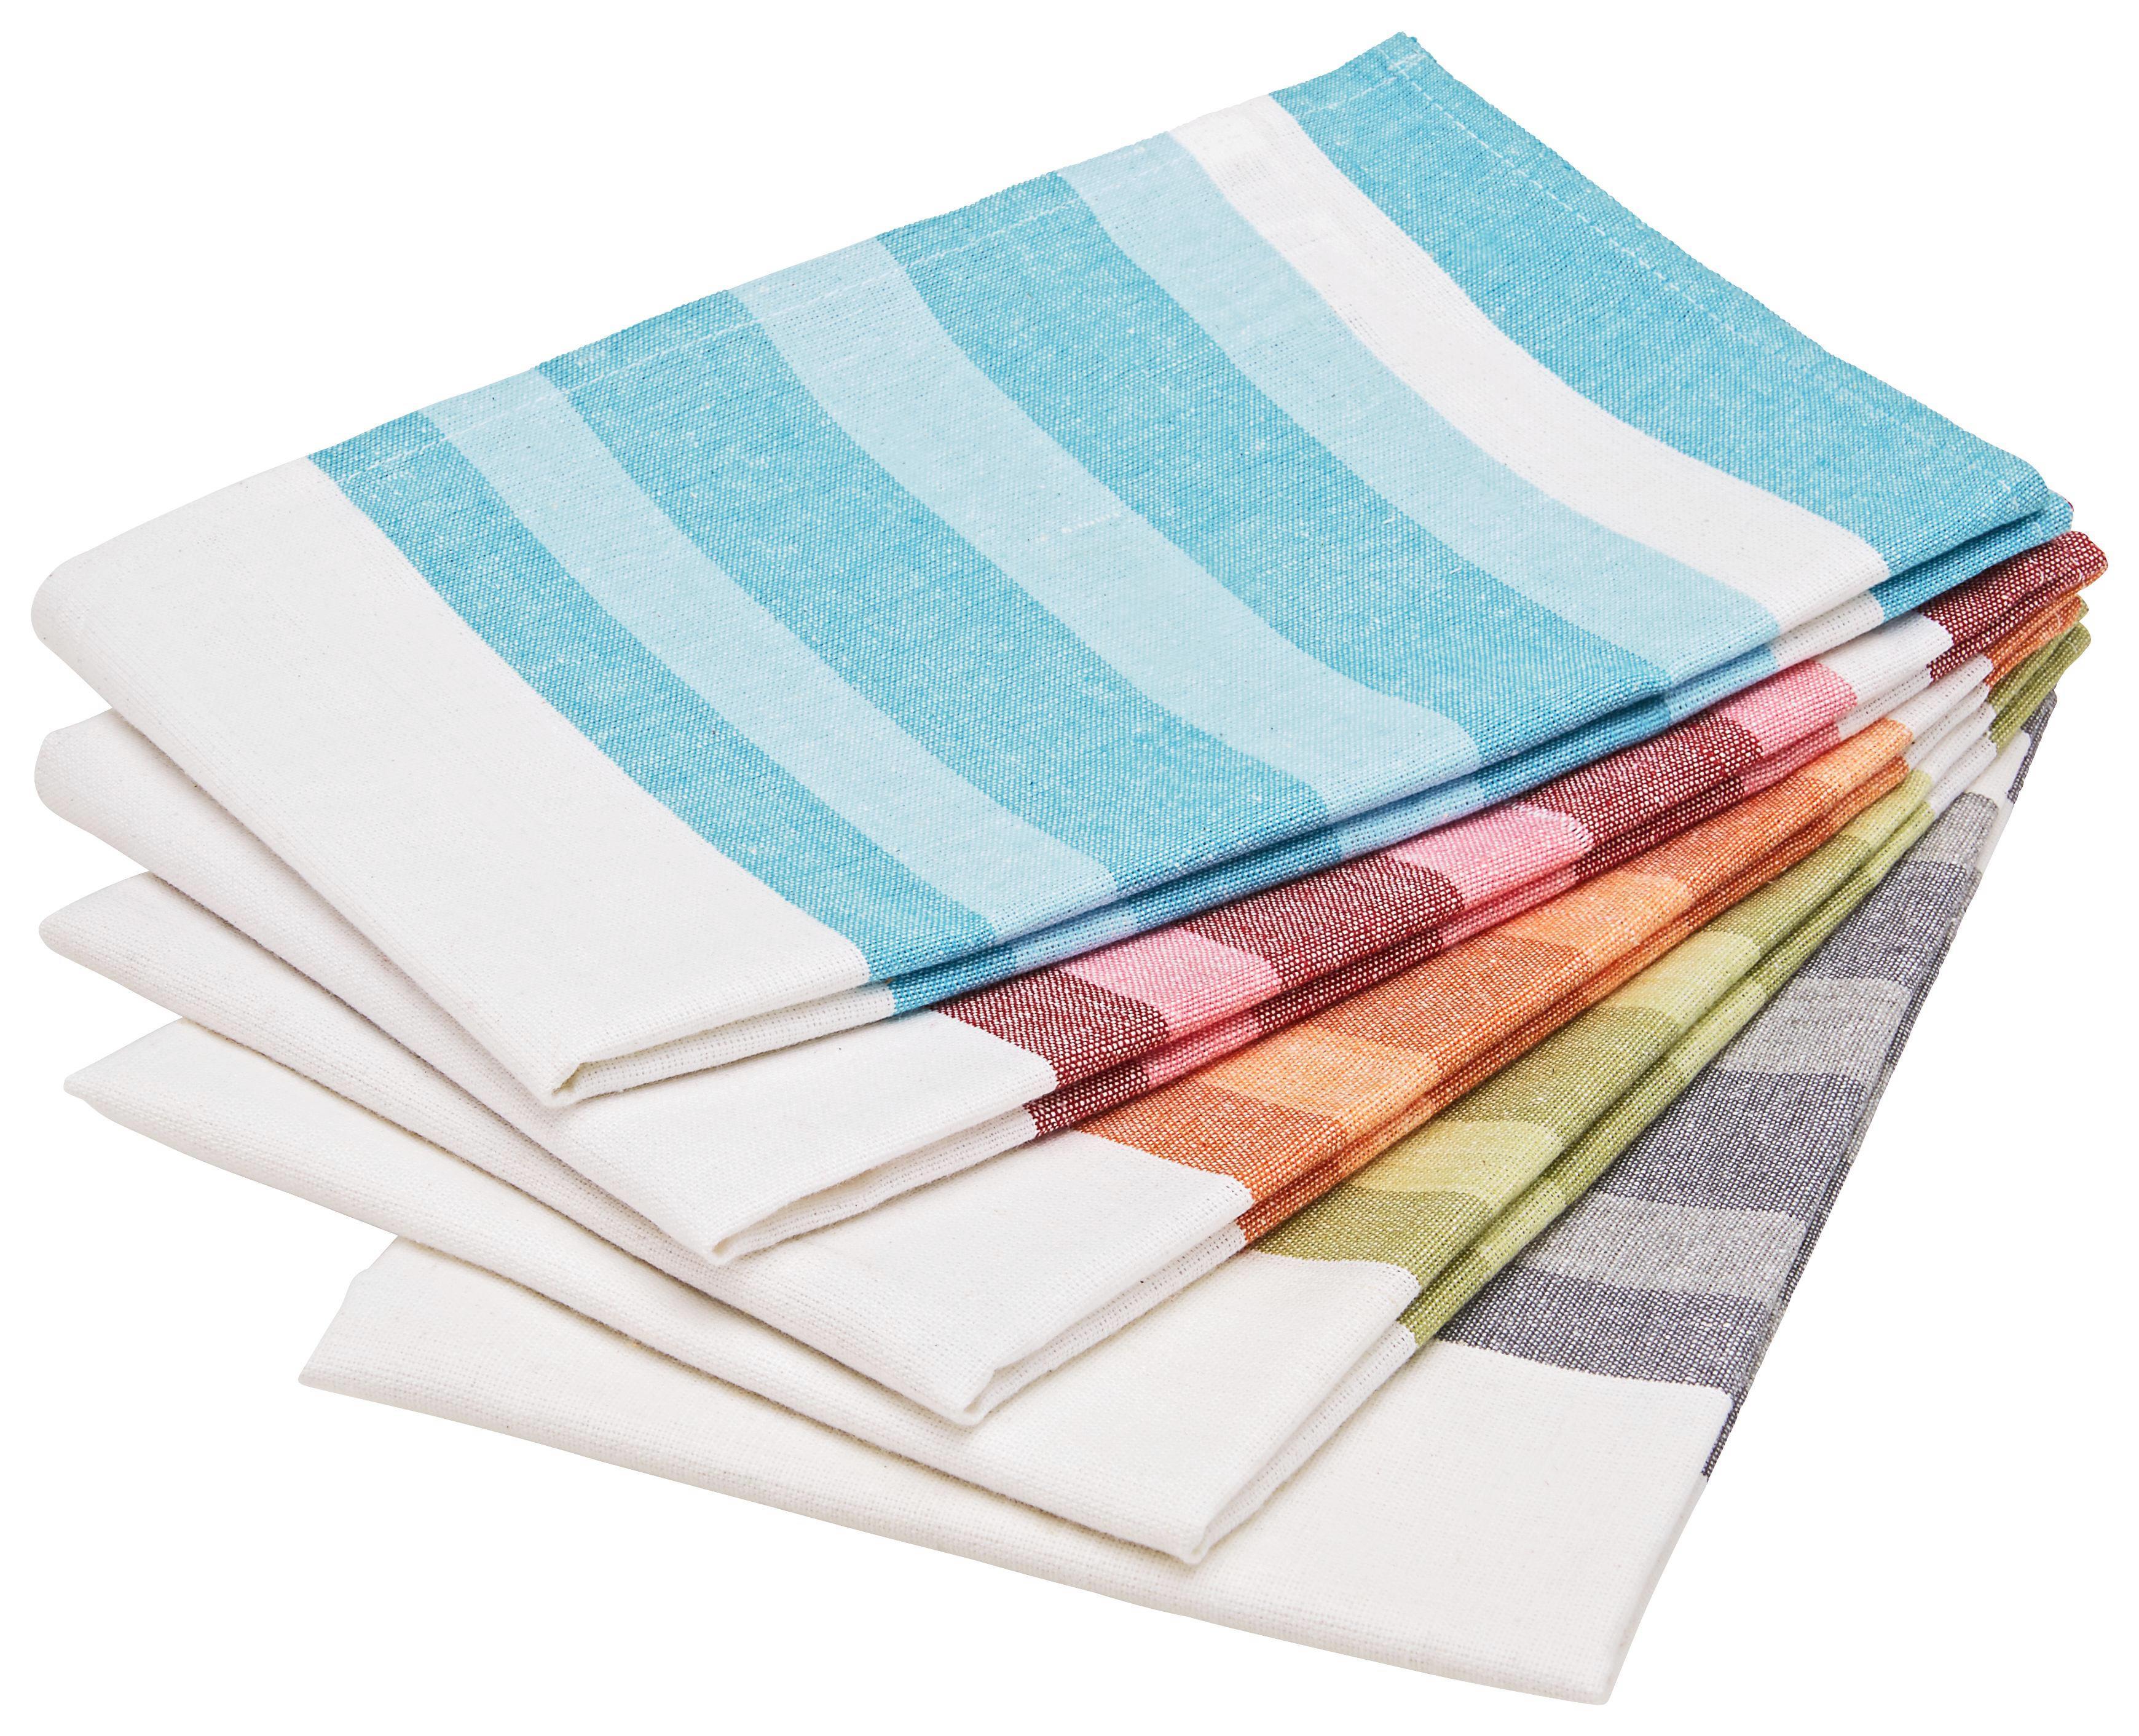 Geschirrtuch-set Streif in verschiedenen Farben - Türkis/Rot, Textil (50/70cm) - MÖMAX modern living